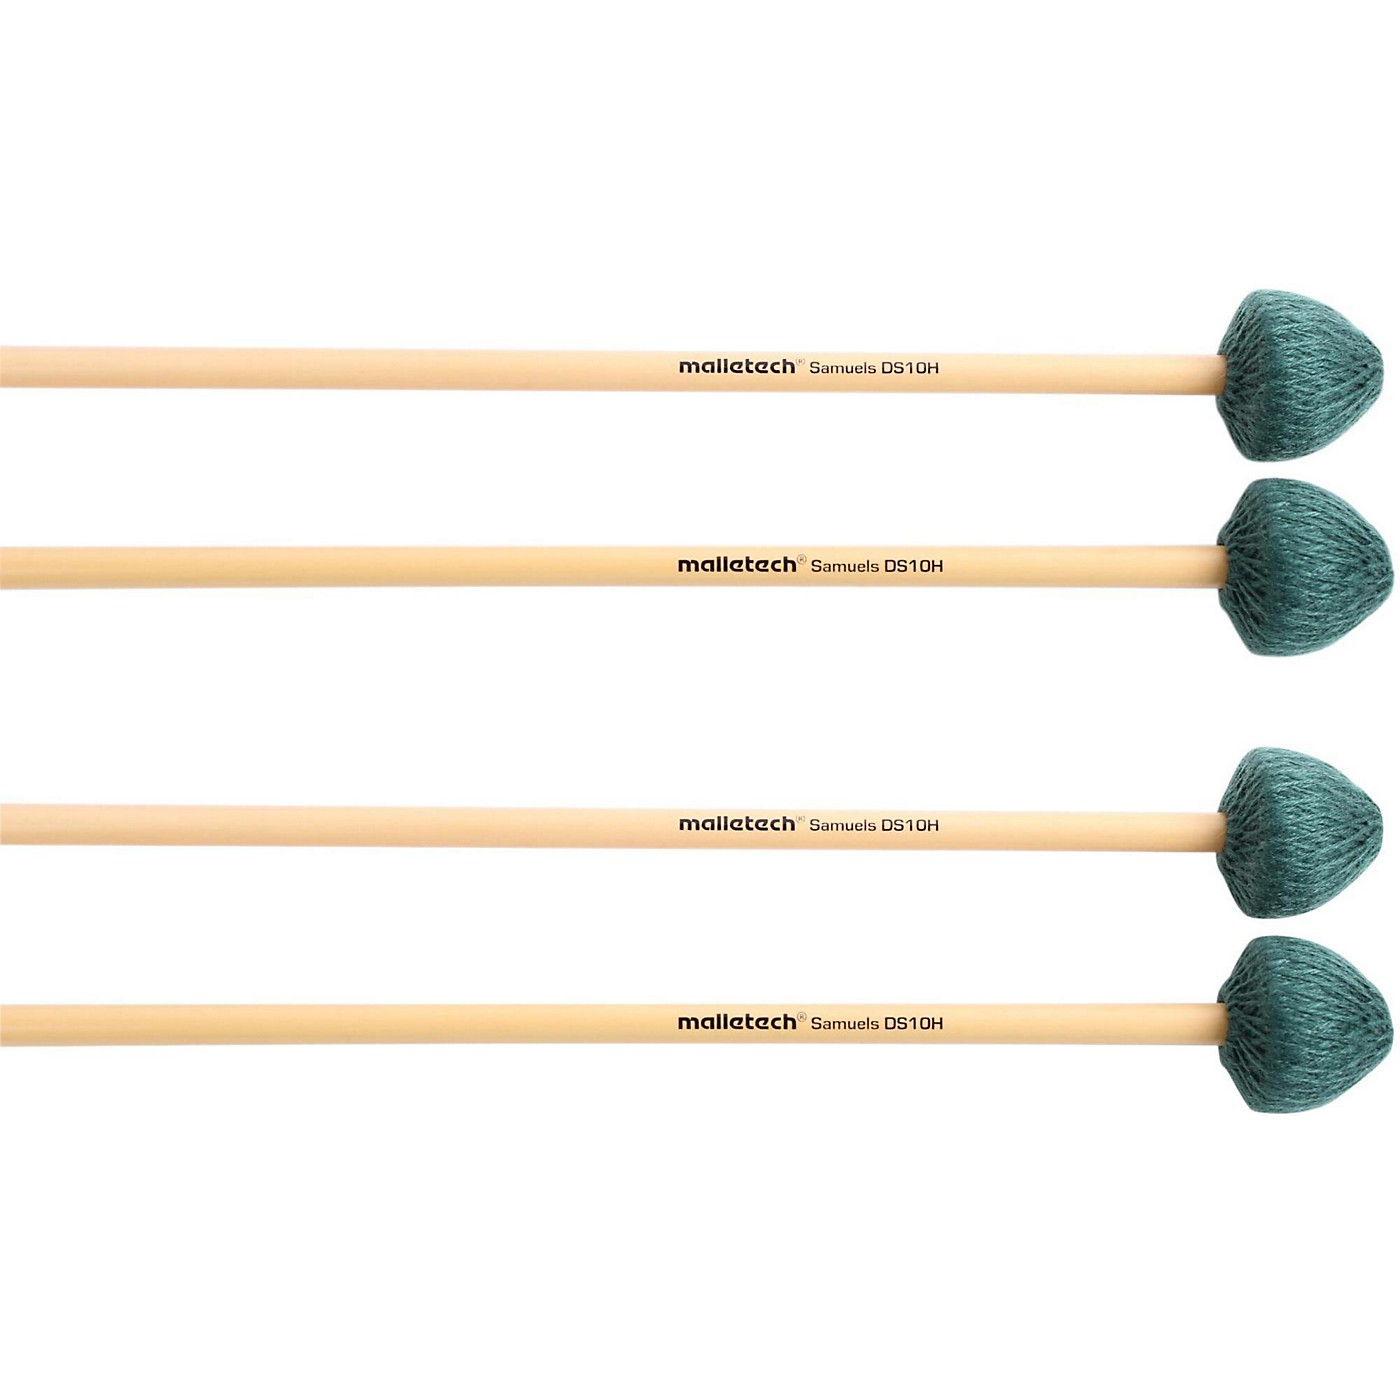 Malletech Samuels Vibraphone Mallets Set of 4 (2 Matched Pairs) thumbnail